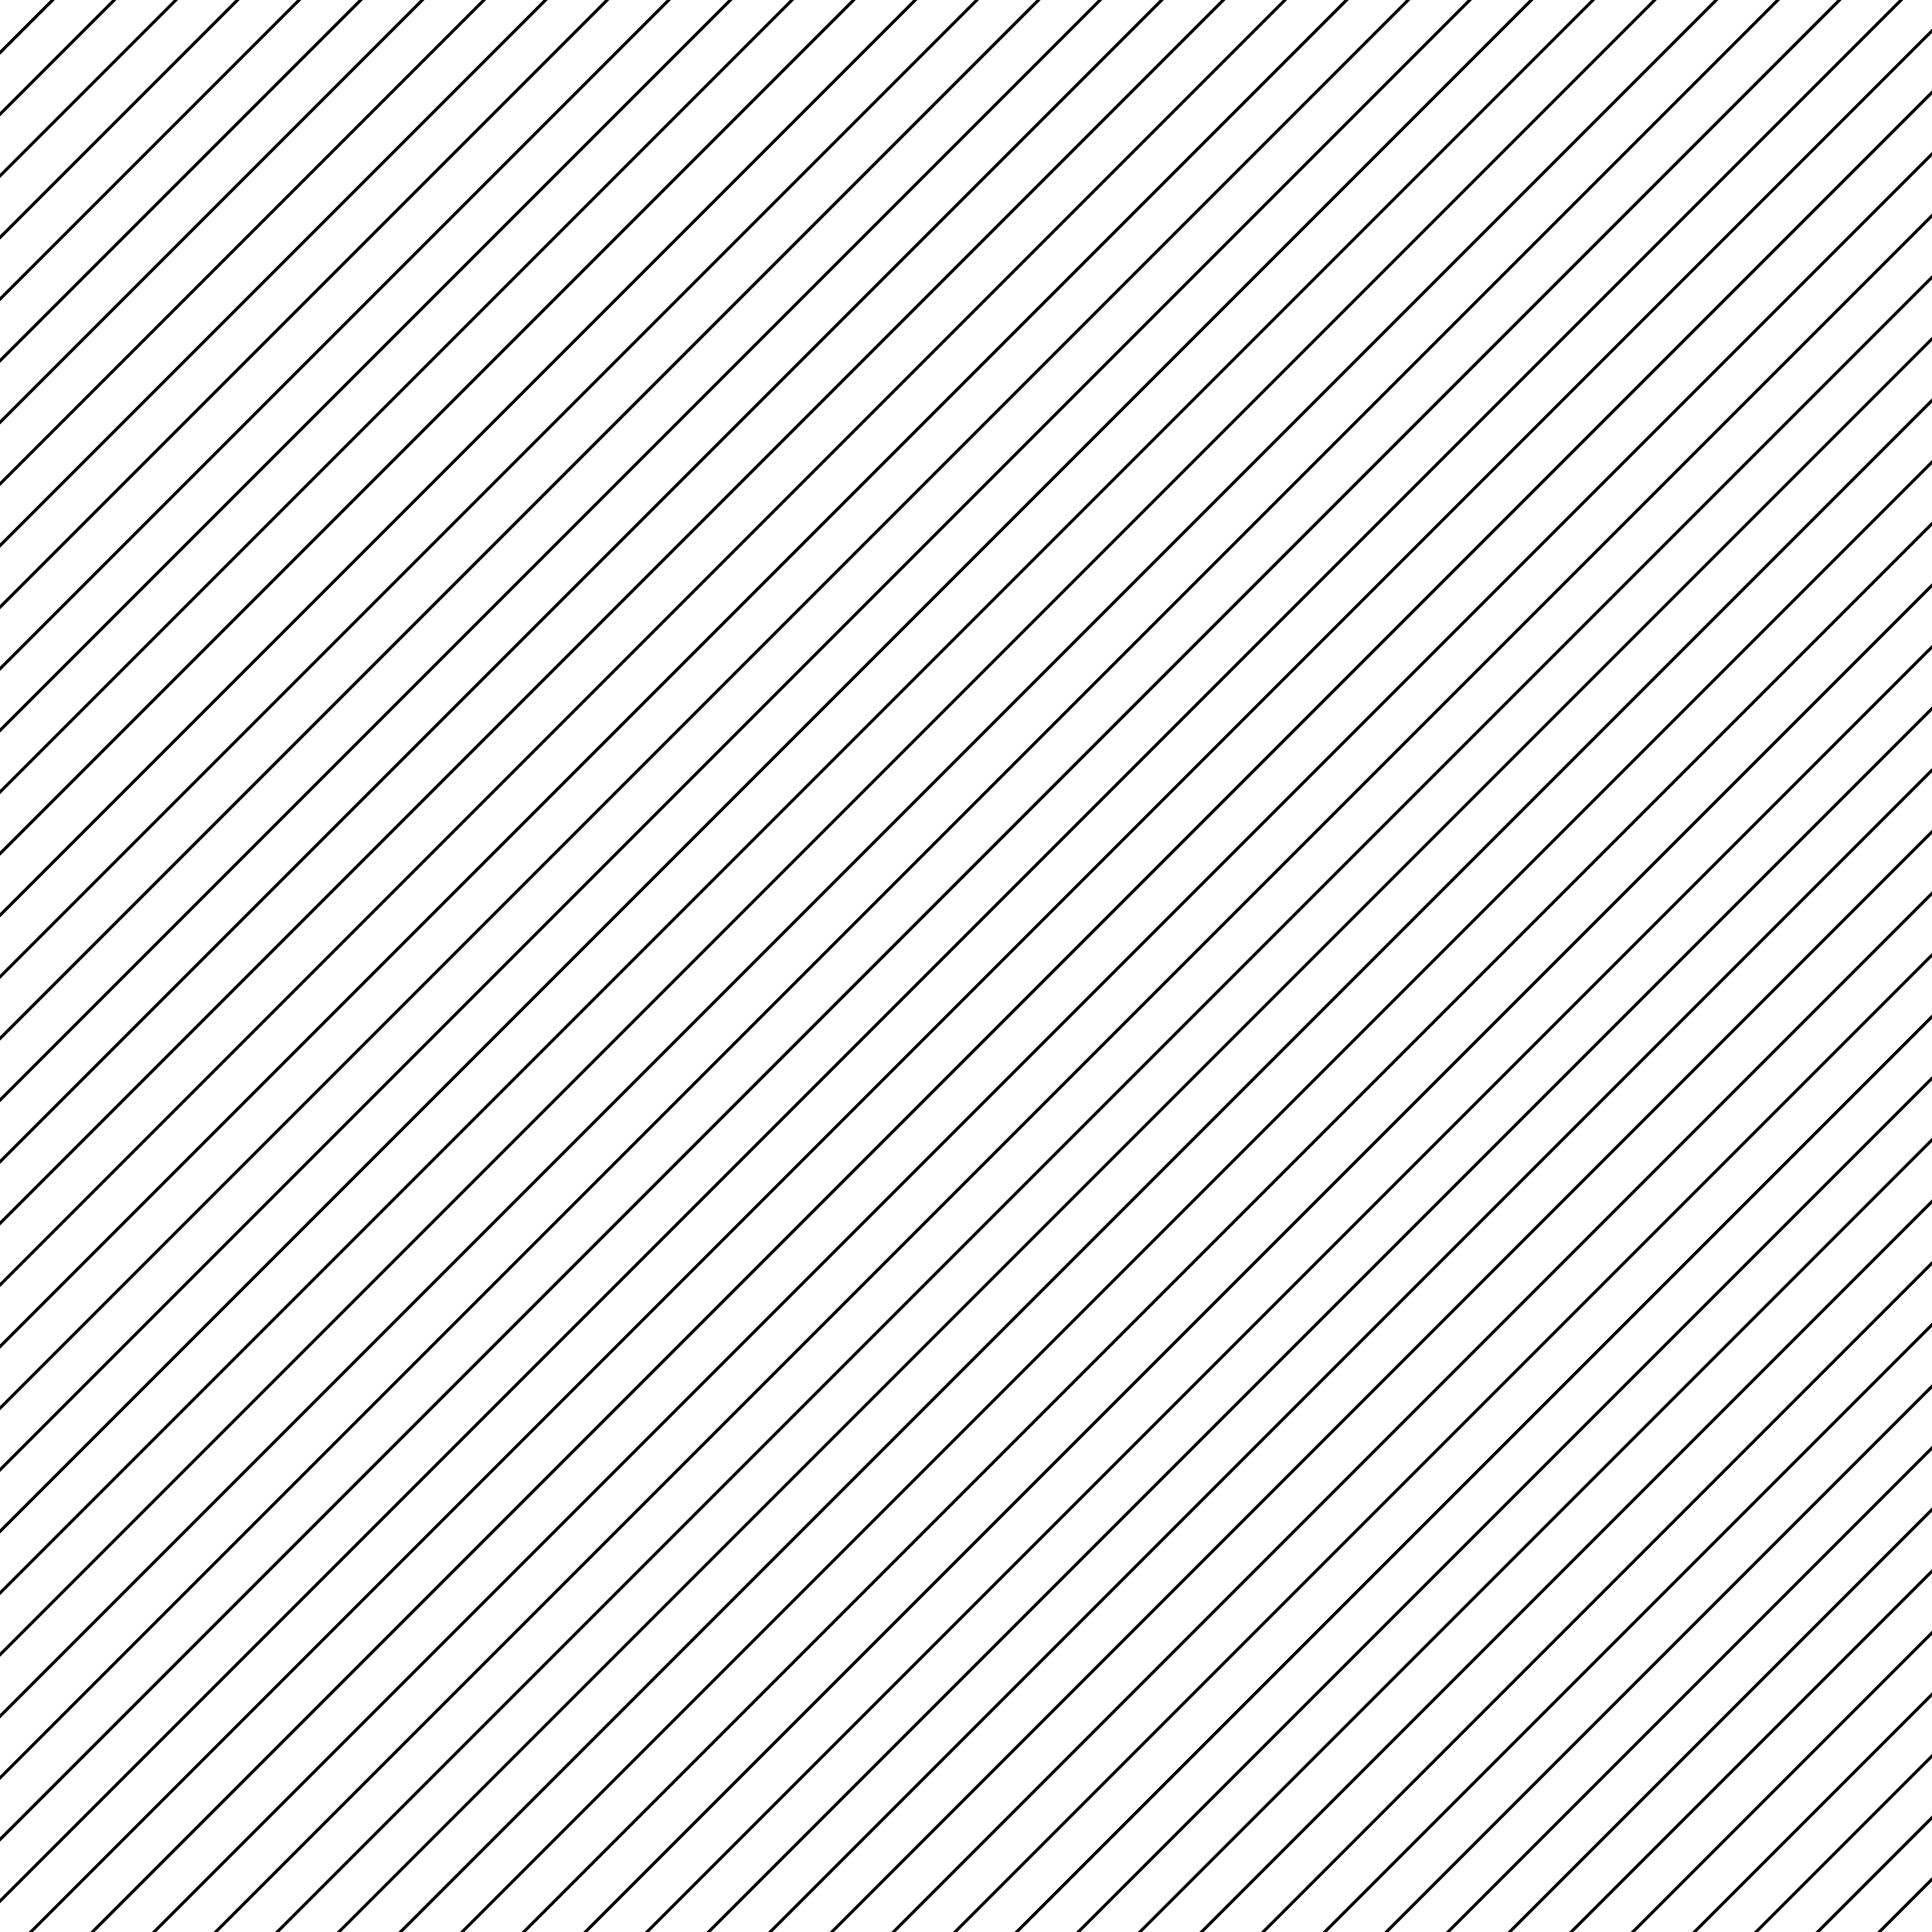 Striped Background Effect Transparent PNG Clip Art Image